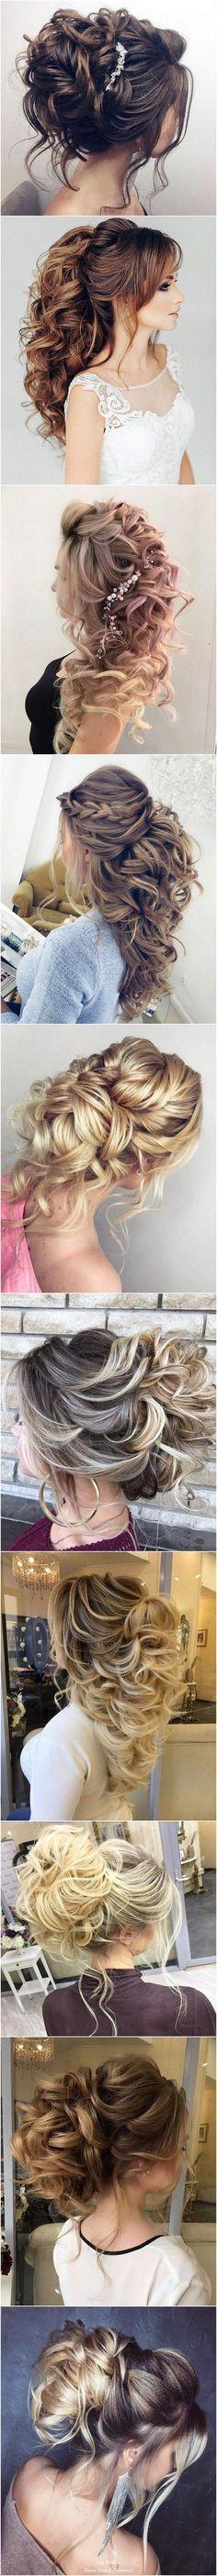 Elstile Long Wedding Hairstyle Inspiration / http://www.deerpearlflowers.com/elstile-long-wedding-hairstyle-inspiration/ #weddinghairstyles #weddingmakeup